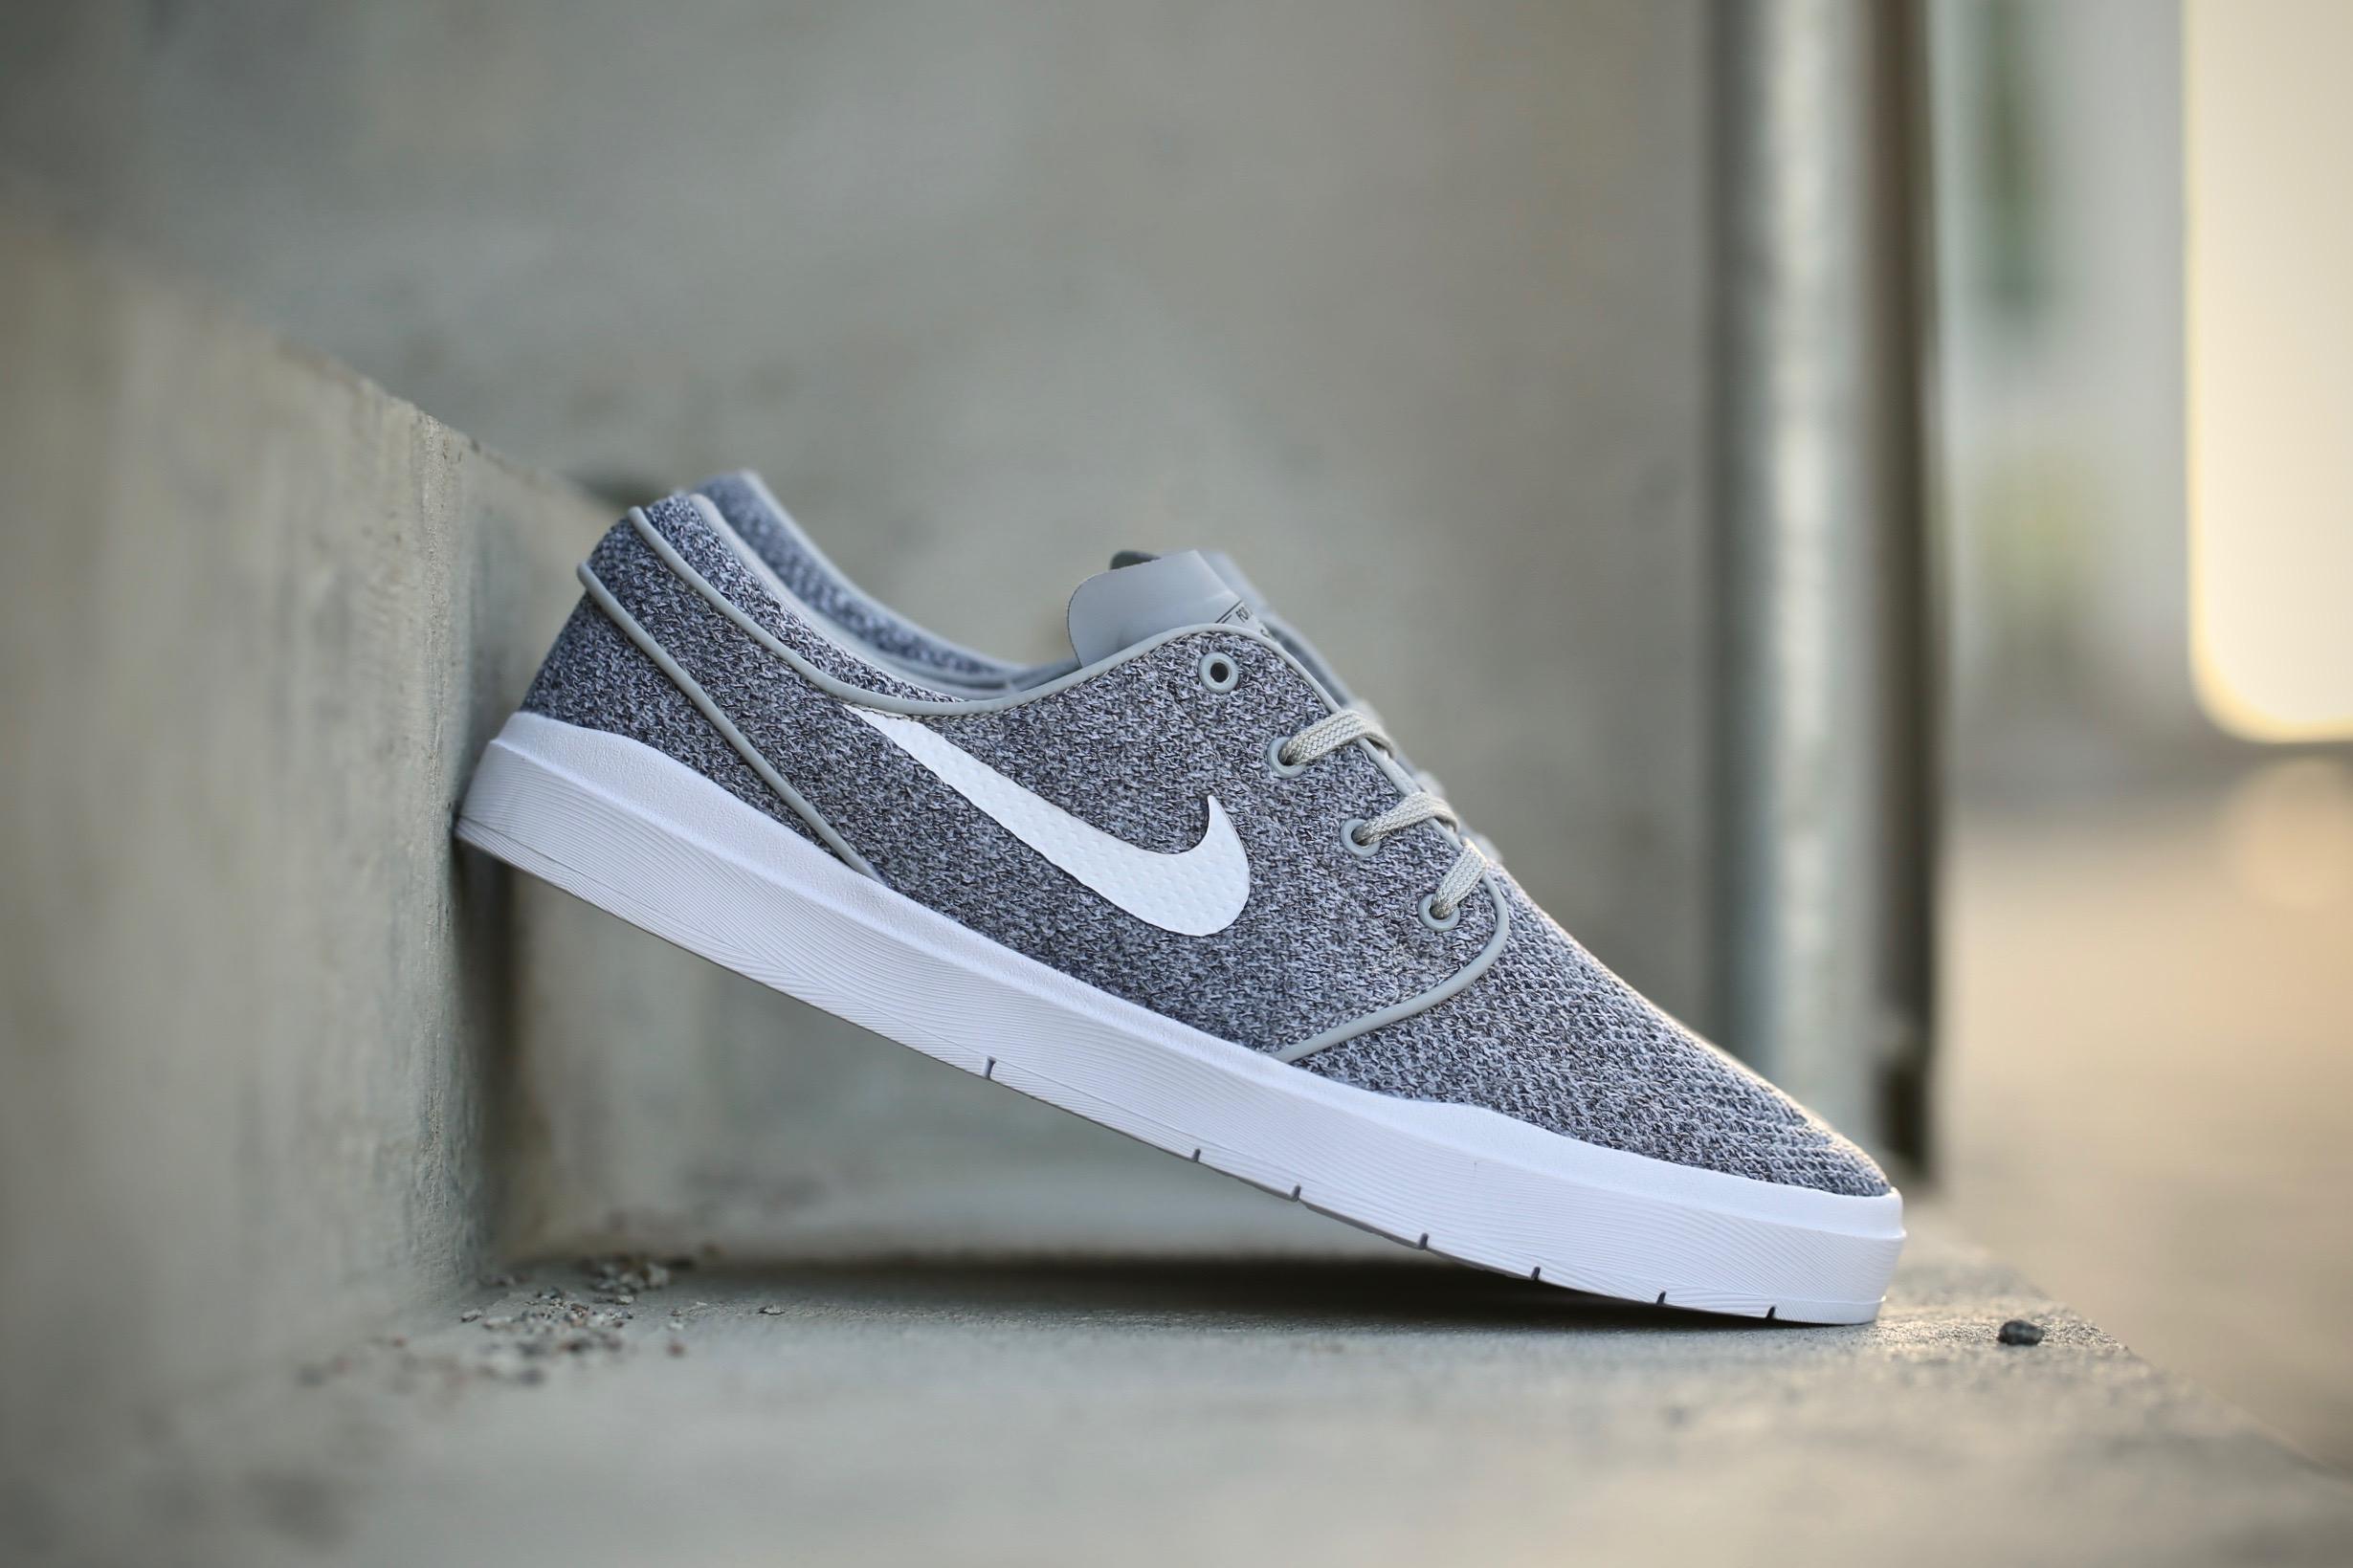 new arrival 5a08a 8fe81 Nike SB Janoski Hyperfeel Mesh – Wolf Grey   White – STASP